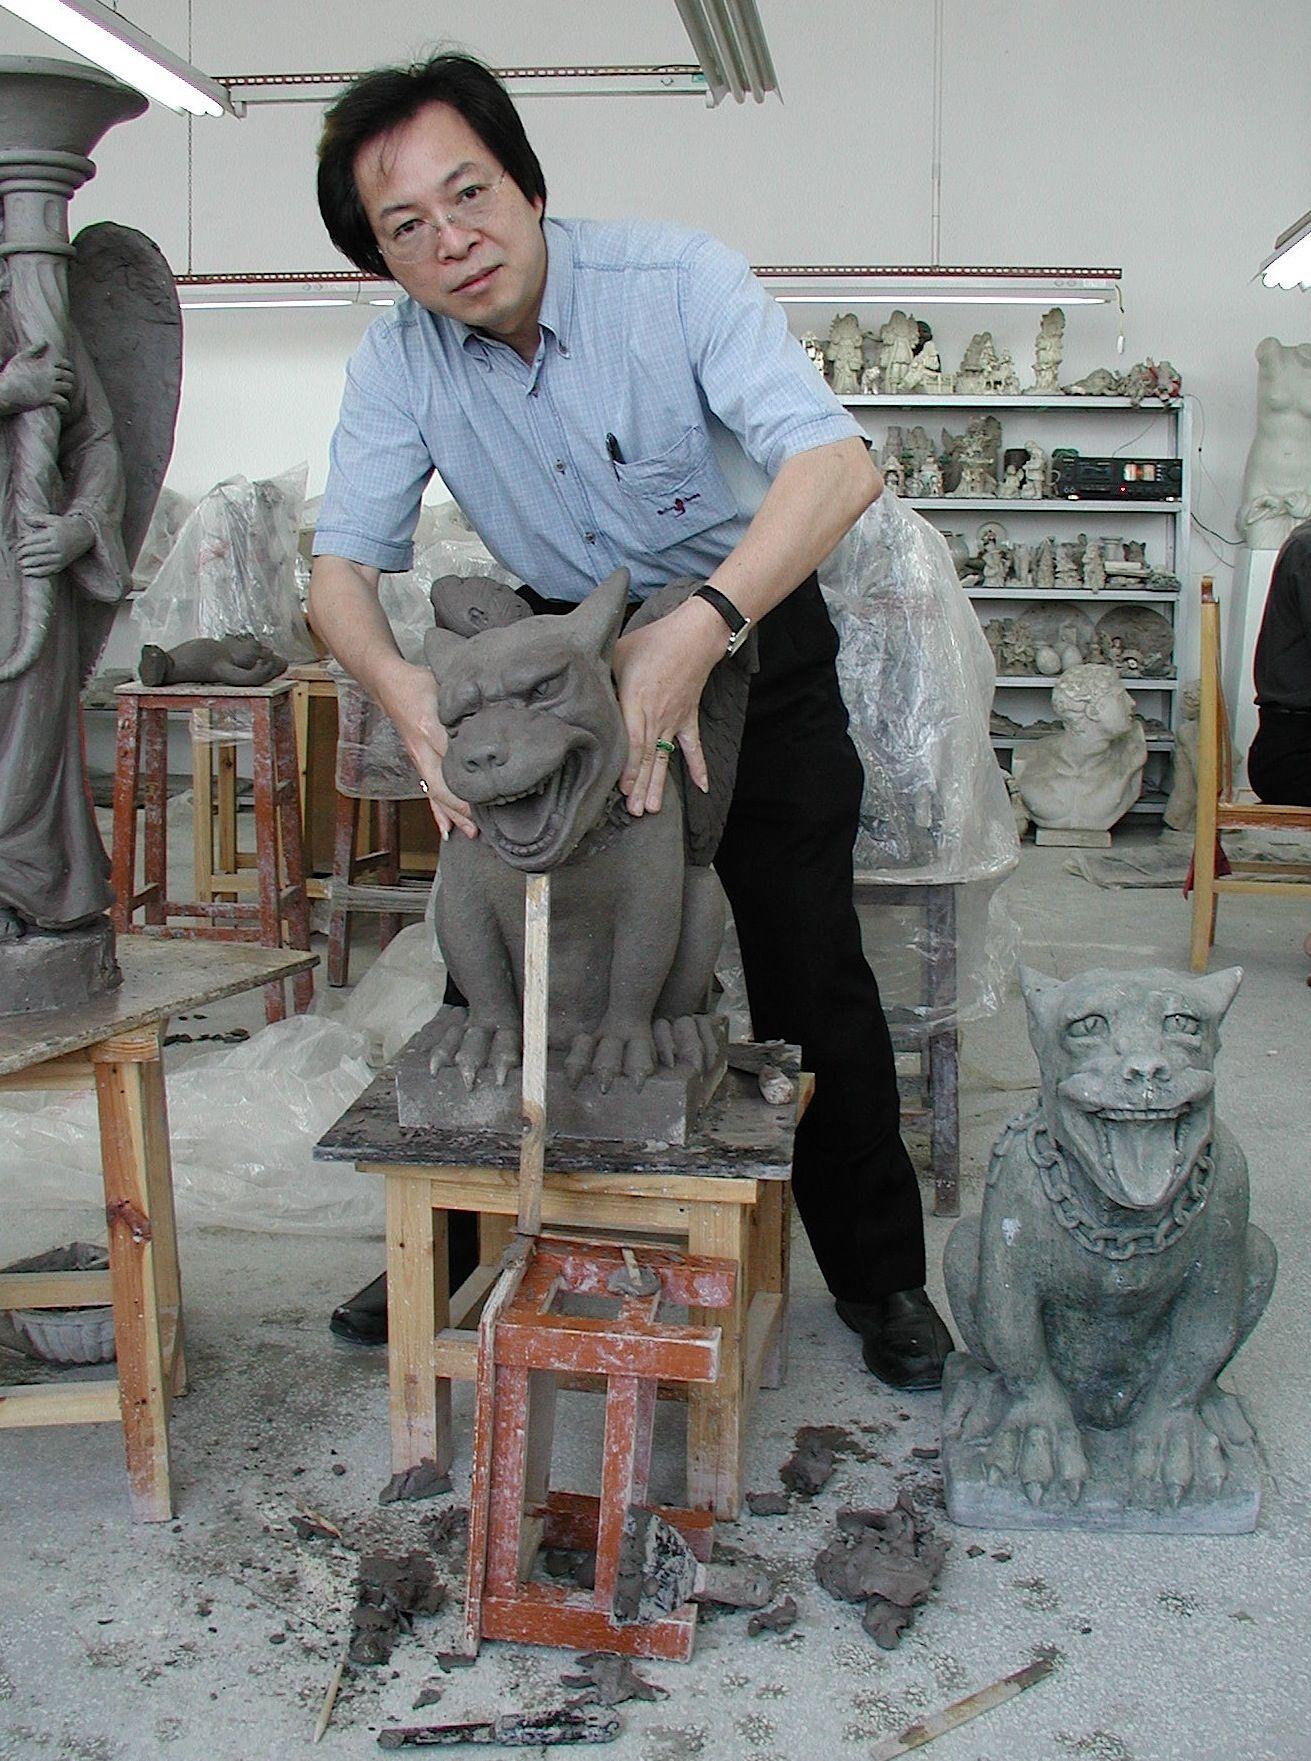 Artist Jaimy